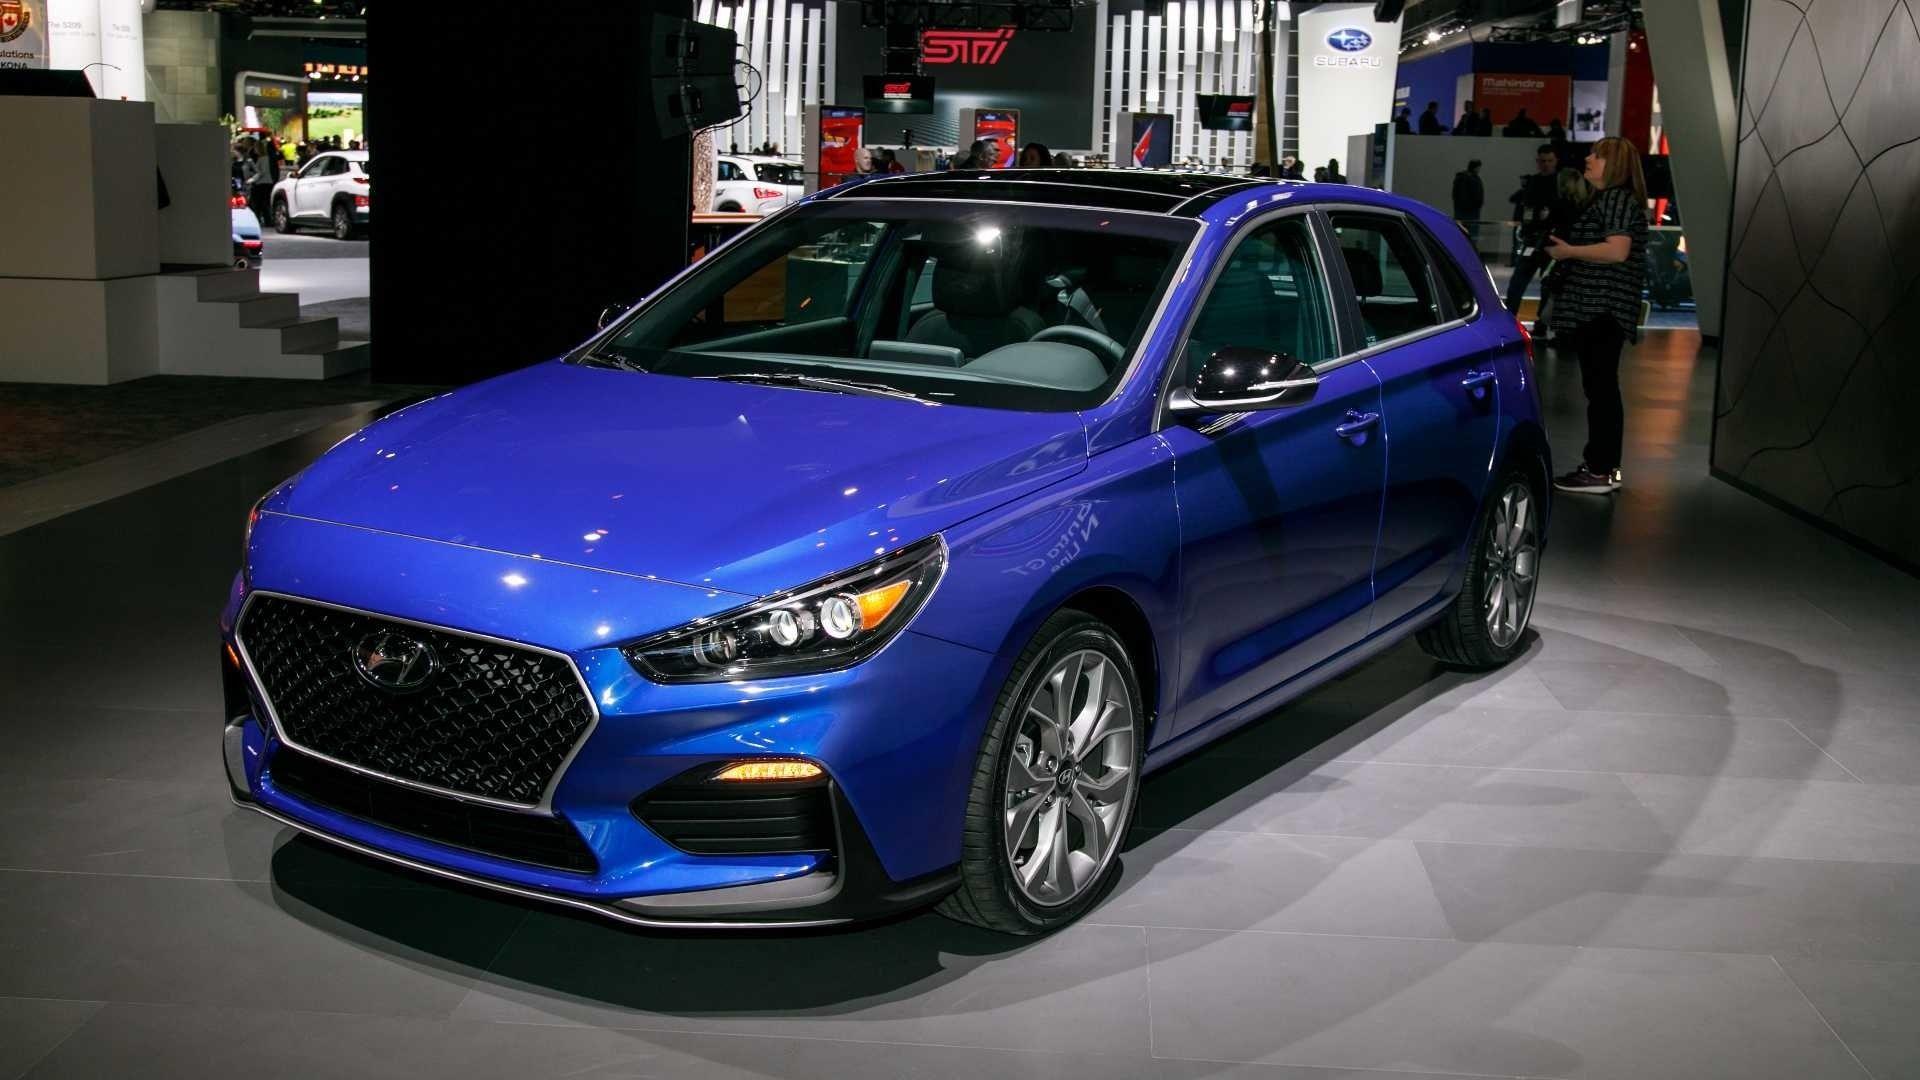 2020 Hyundai Elantra Gt Price And Release Date Hyundai Elantra Hyundai Motor Elantra